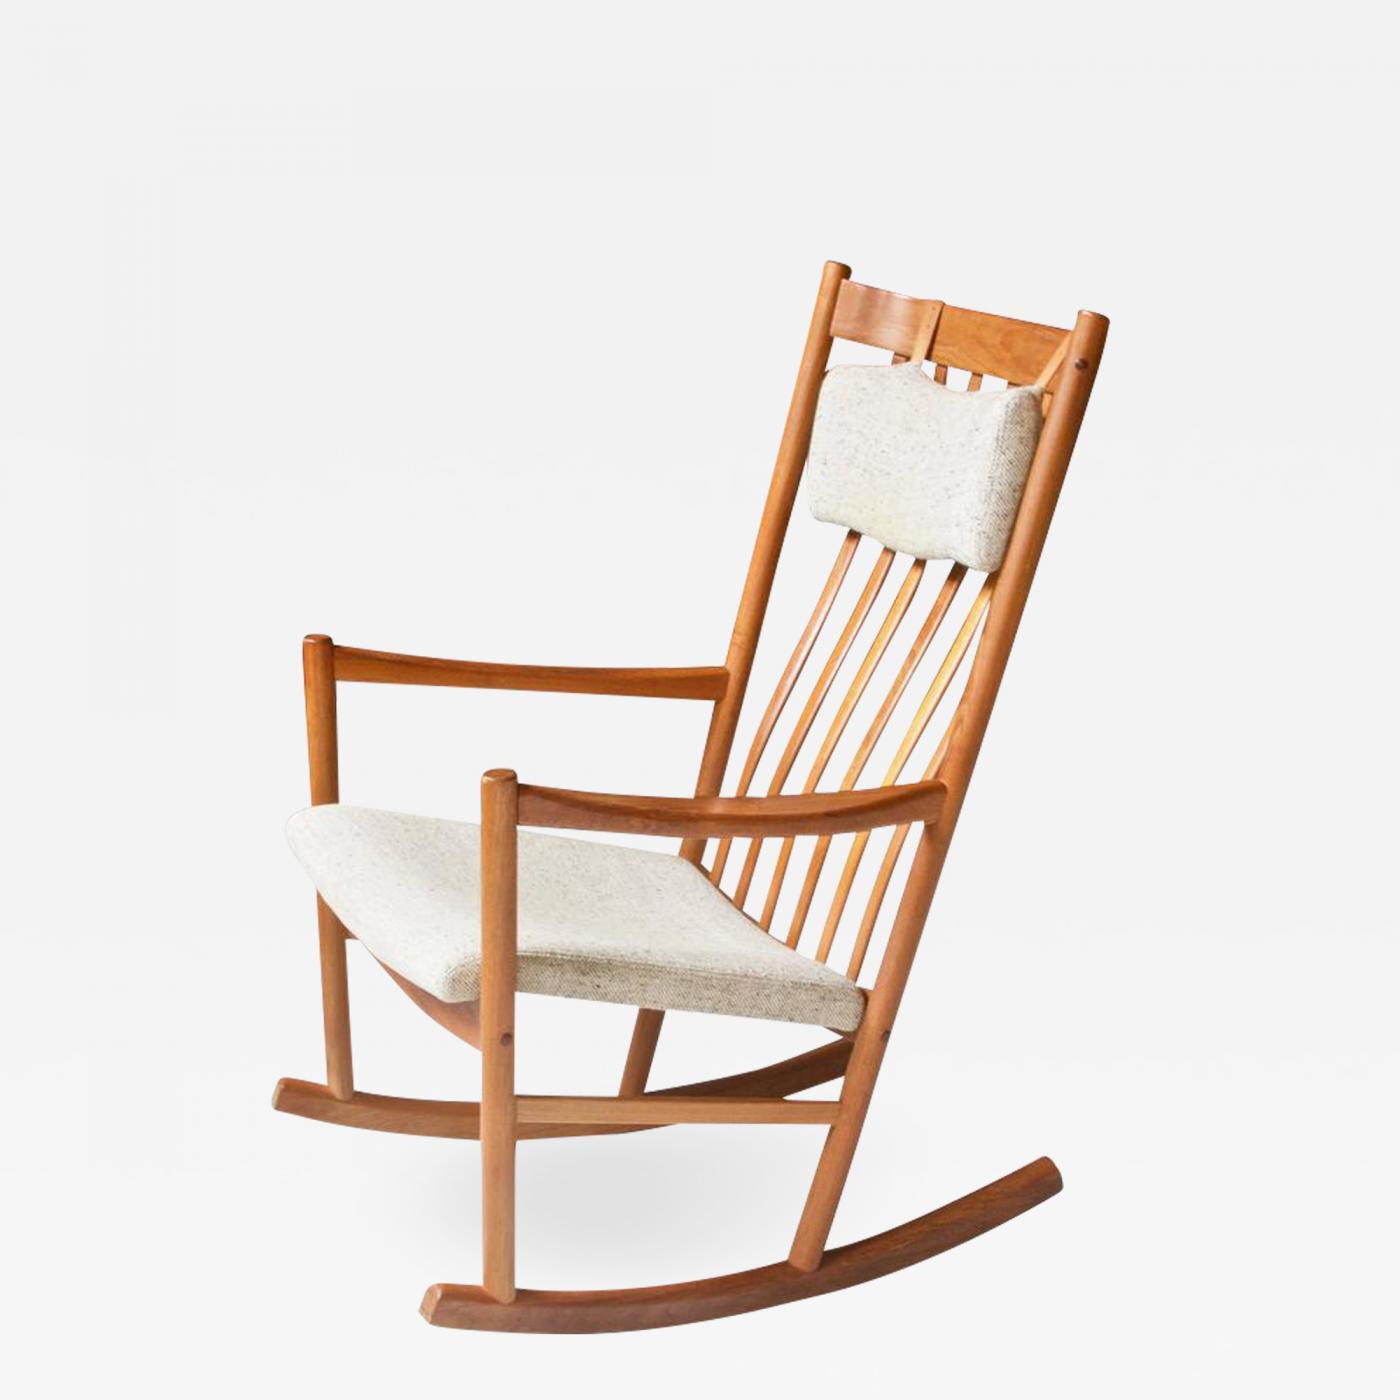 hans wegner rocking chair oak kitchen chairs uk vintage for tarm stole teak and wool 1960s